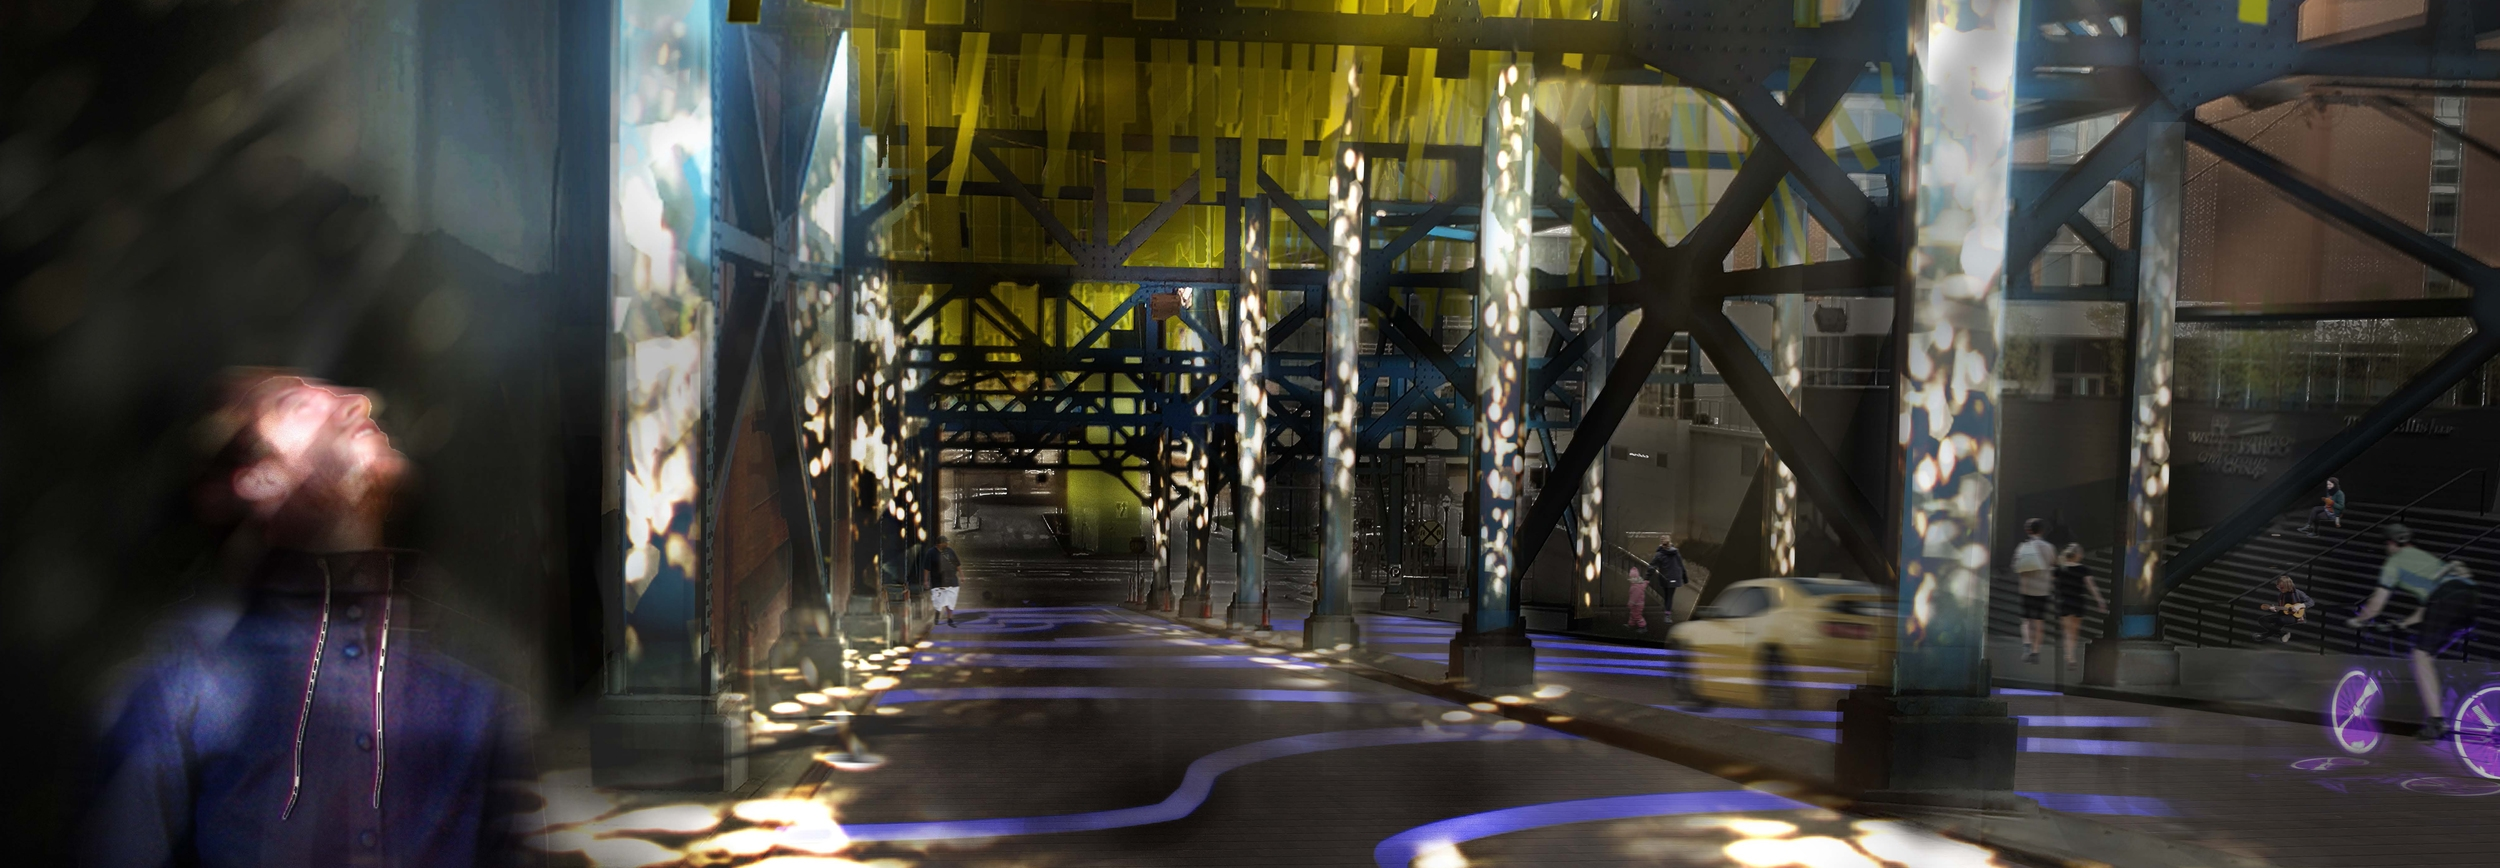 BA_Main Avenue Bridge Underpass_2015_5.jpg